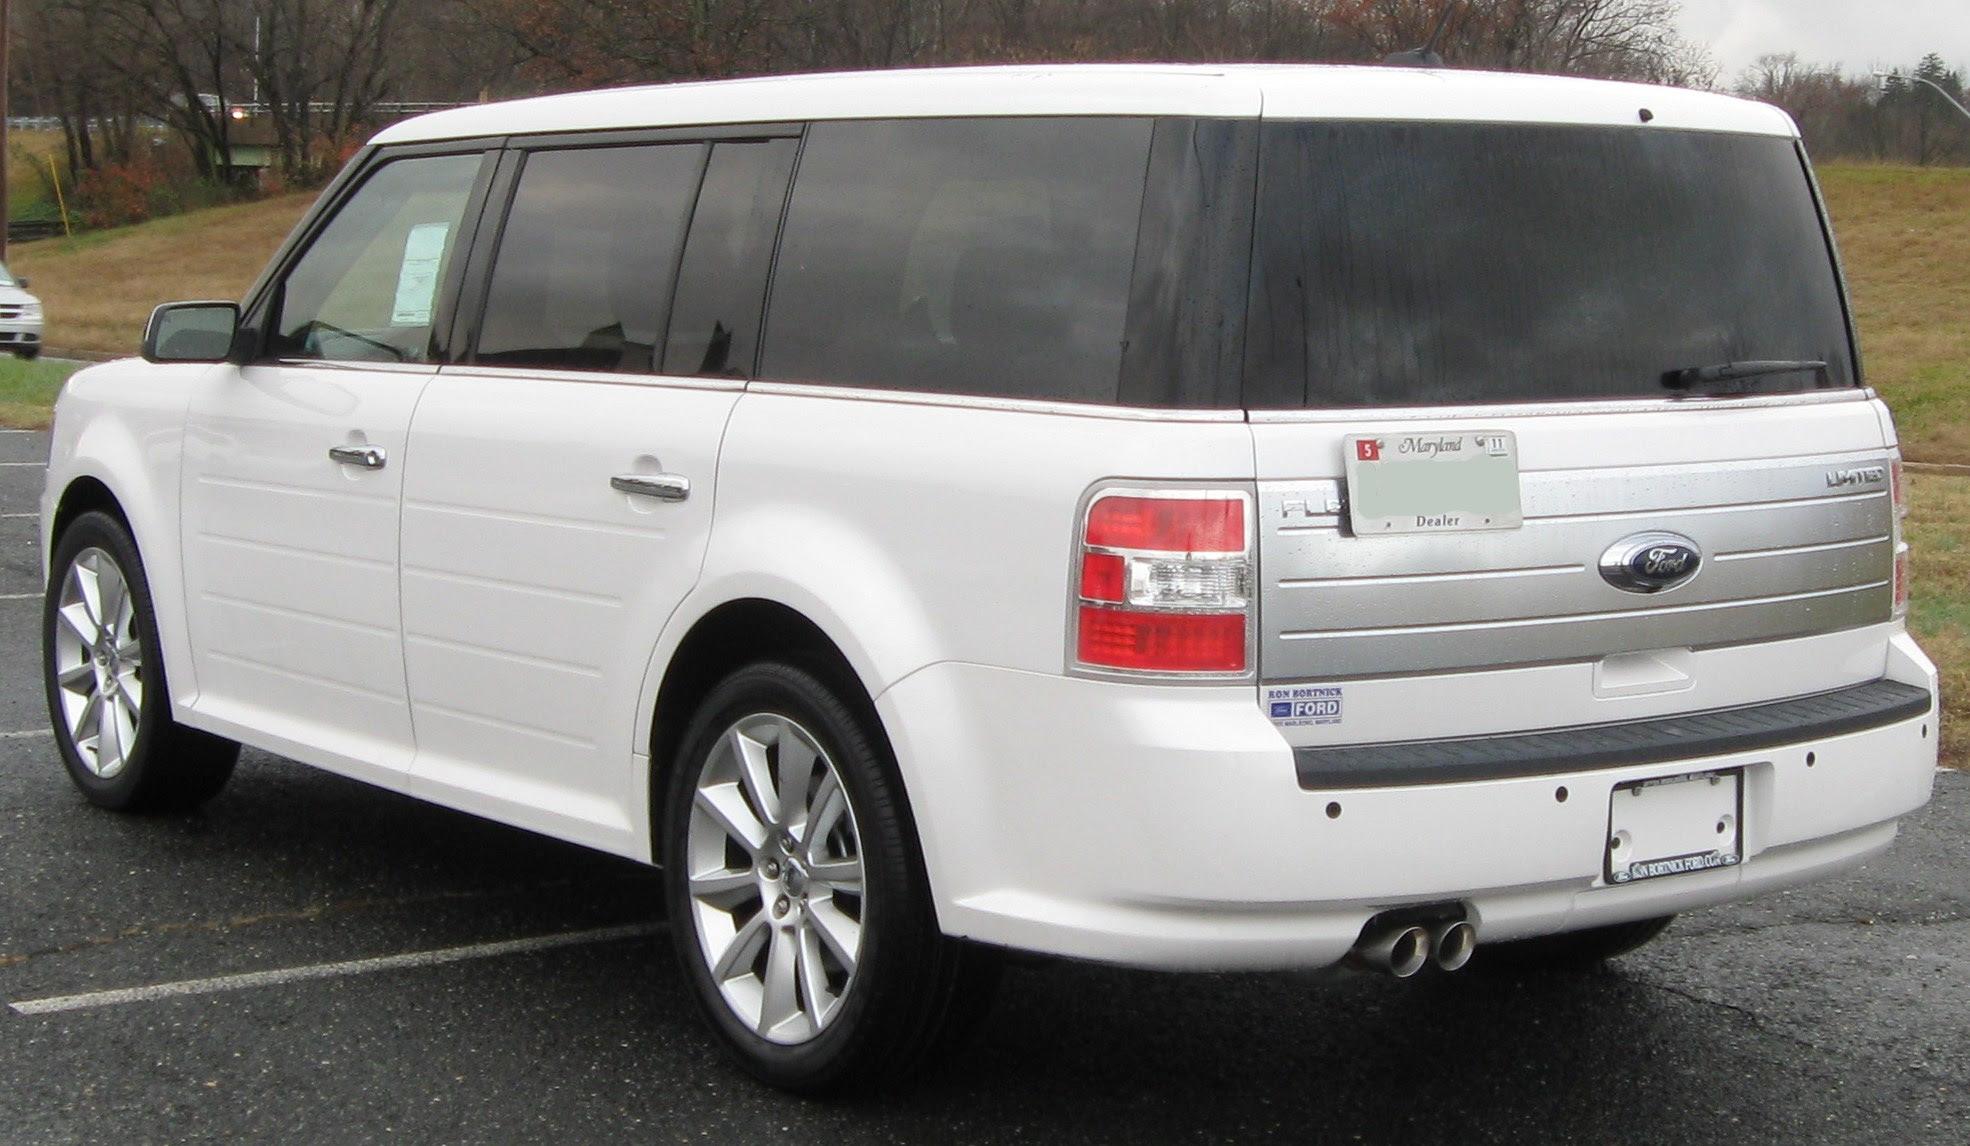 File:2010 Ford Flex Limited rear -- 11-25-2009.jpg - Wikipedia